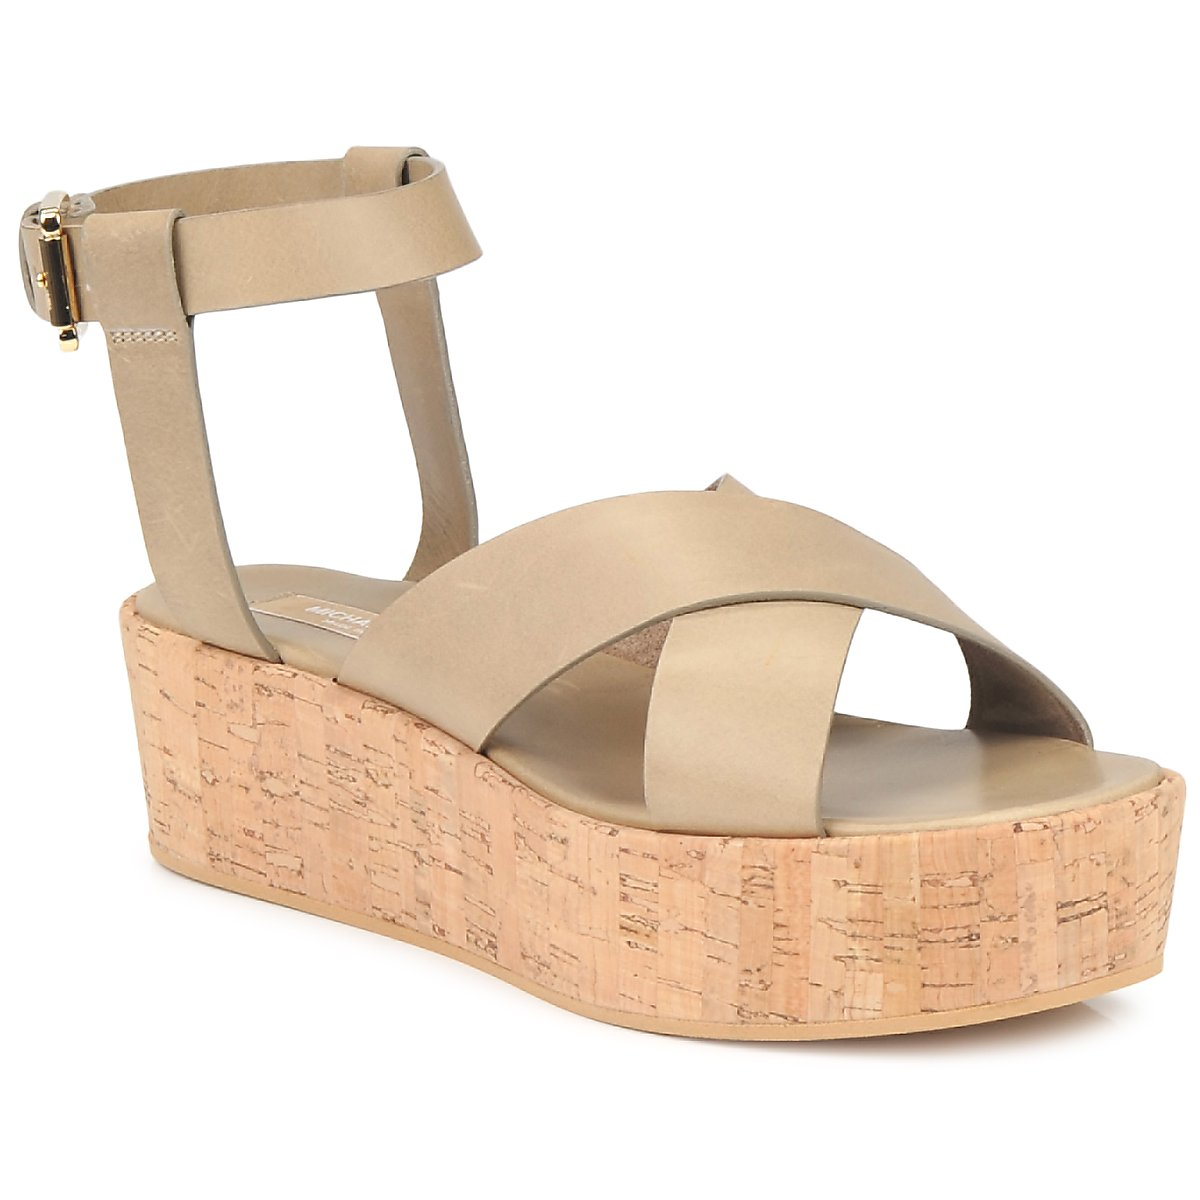 Sandale Michael Kors MK18132 Sand